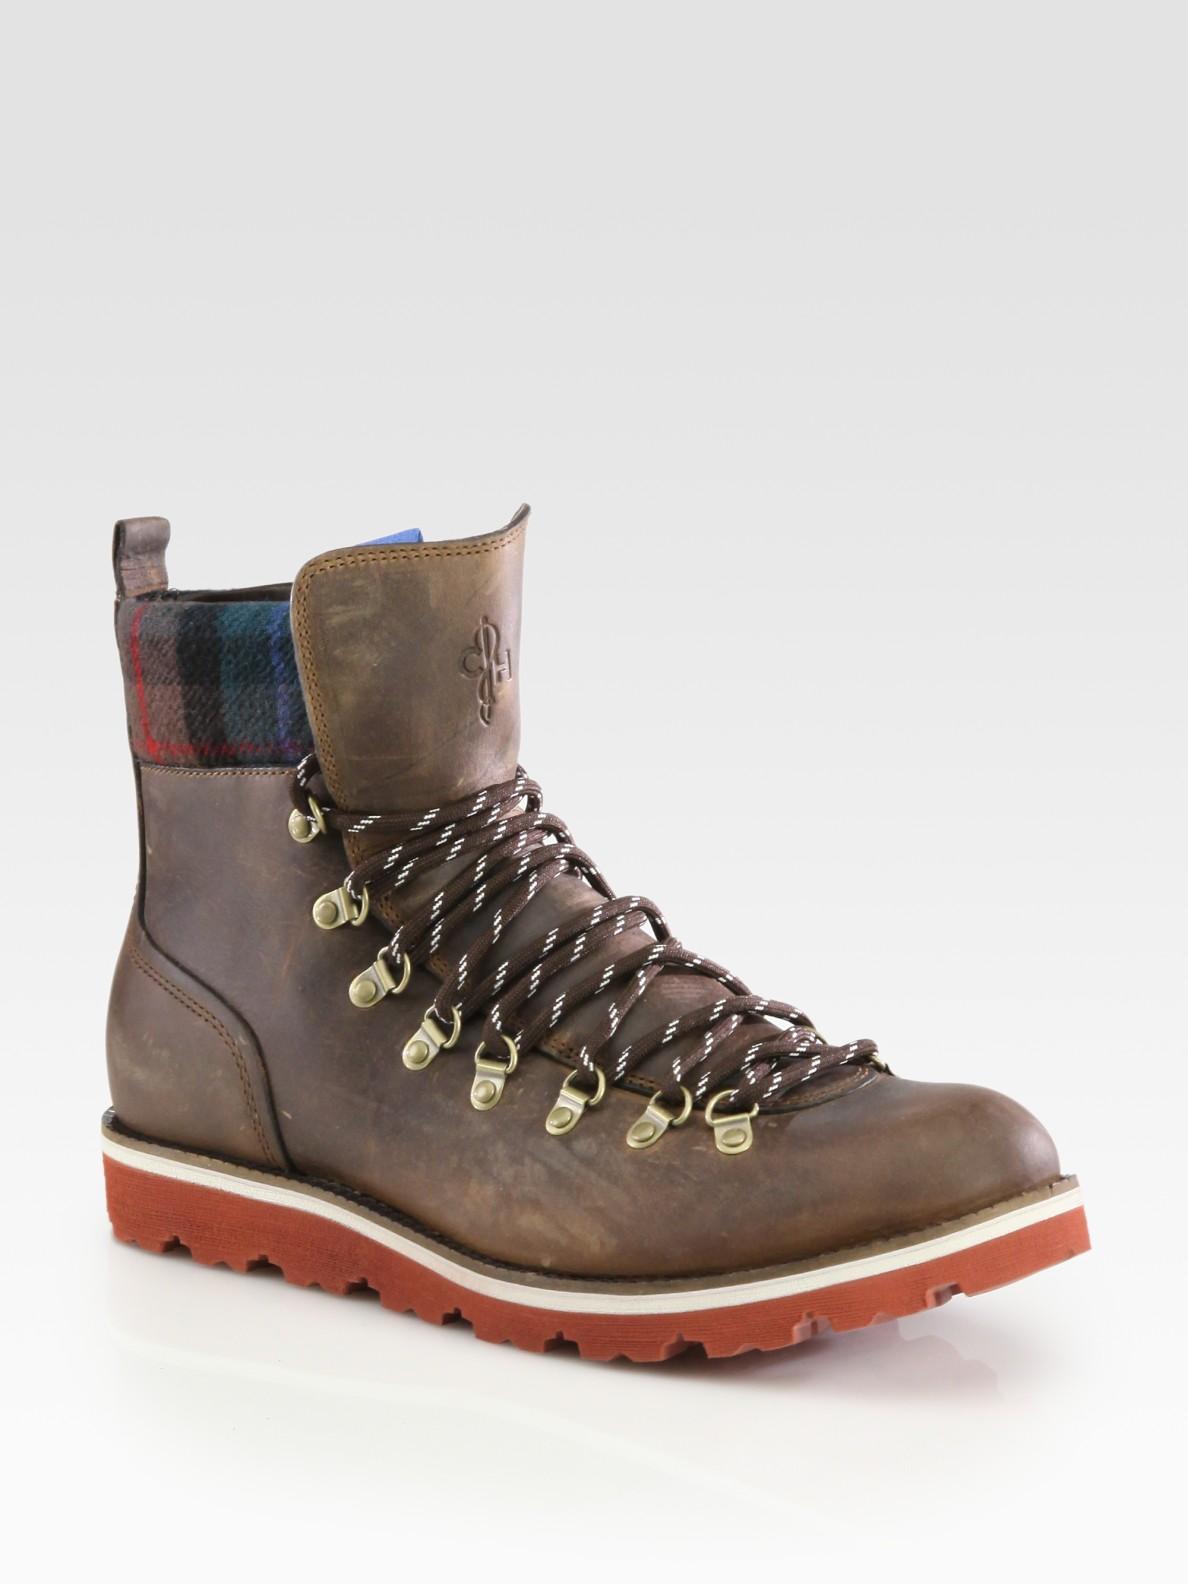 Cole Haan Air Hunter Hiker Boot In Brown For Men Cigar